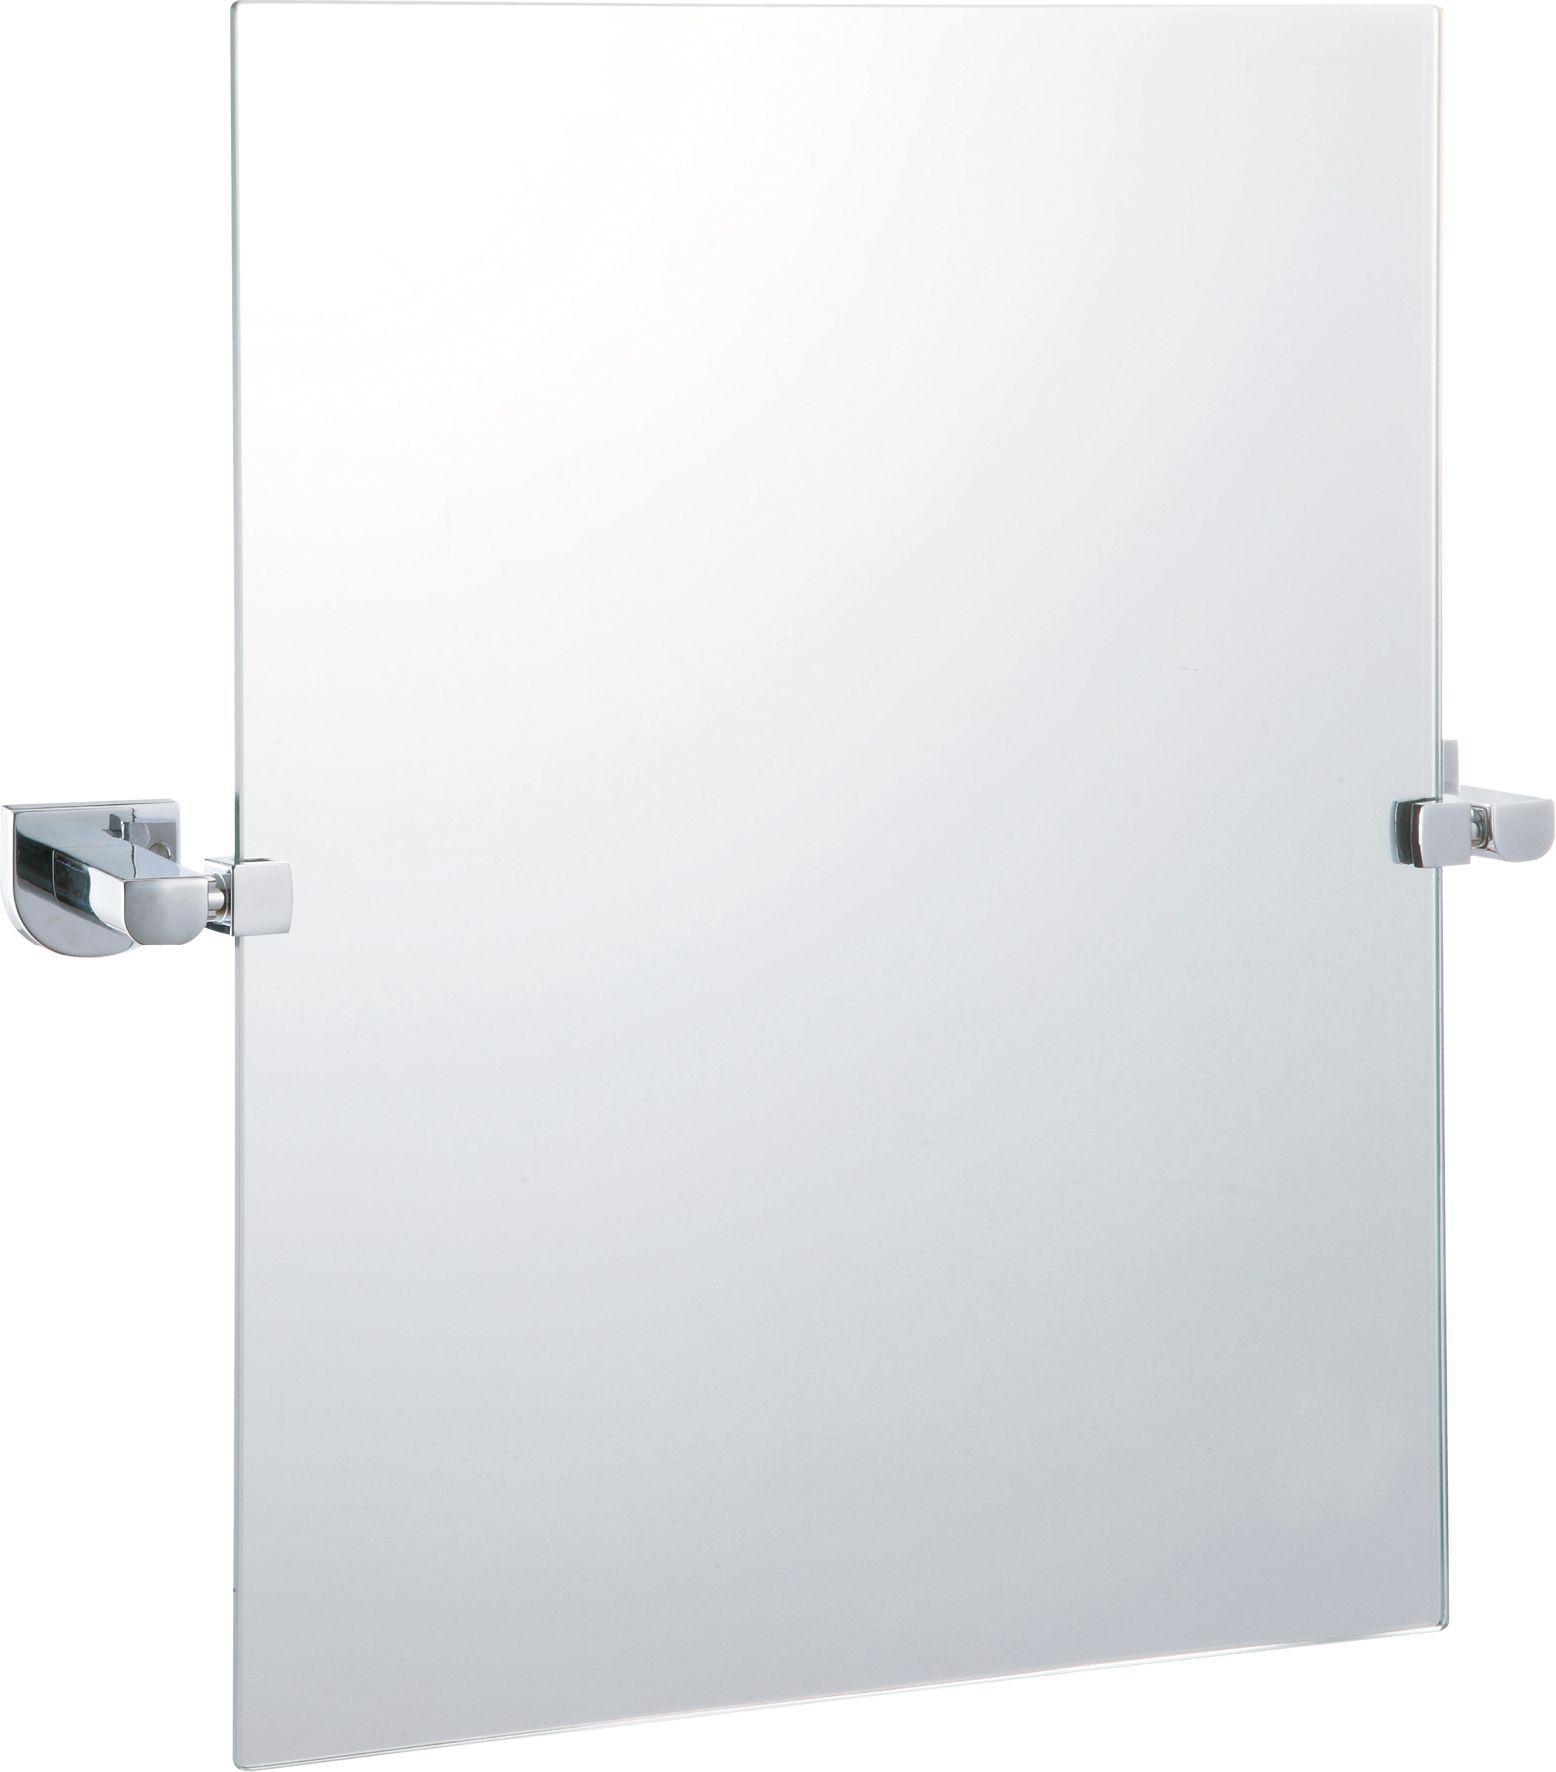 Bathroom Mirror Lights B&Q b&q axis square wall mirror (w)497mm (h)500mm | departments | diy